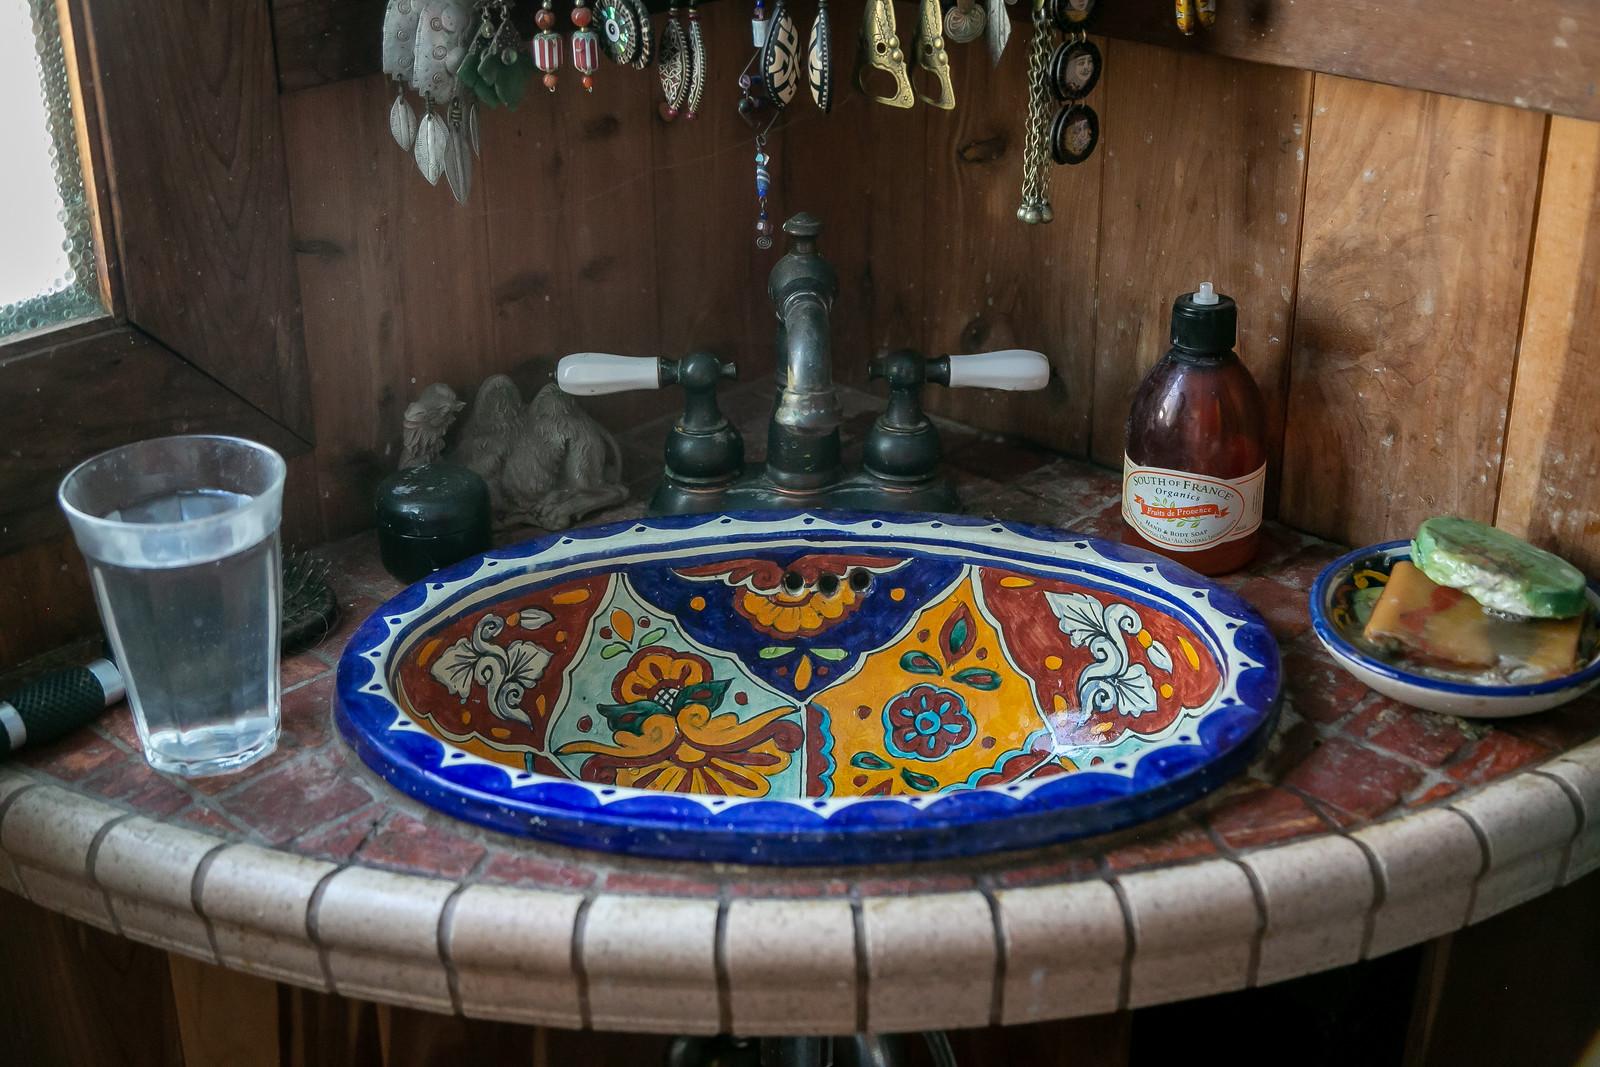 Tiles set by Lisa Bullwinkel's husband Tim.